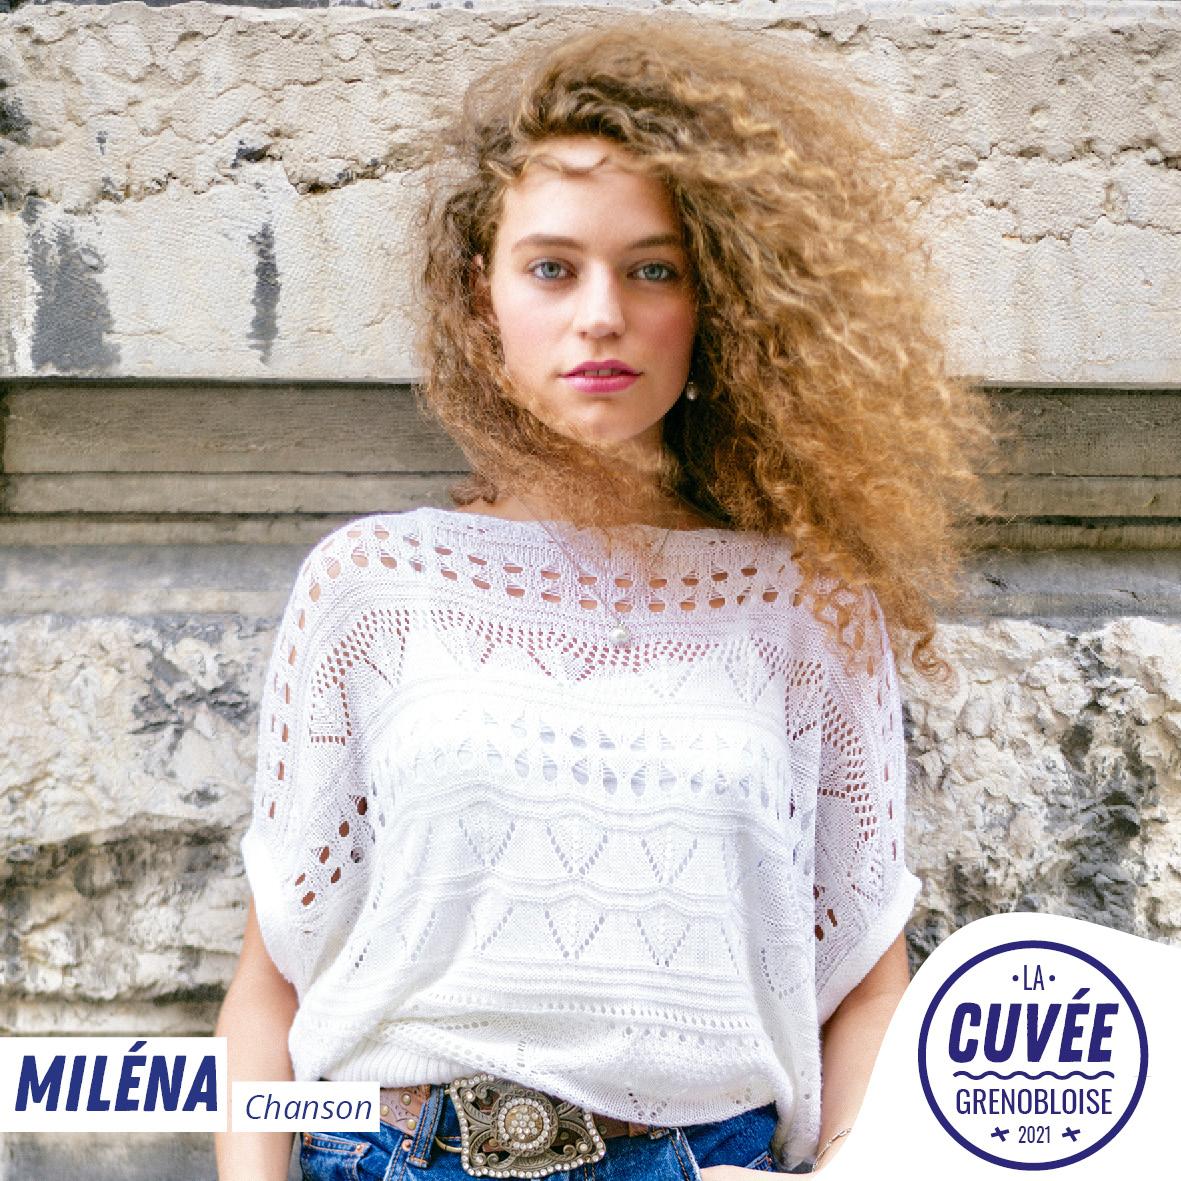 Miléna